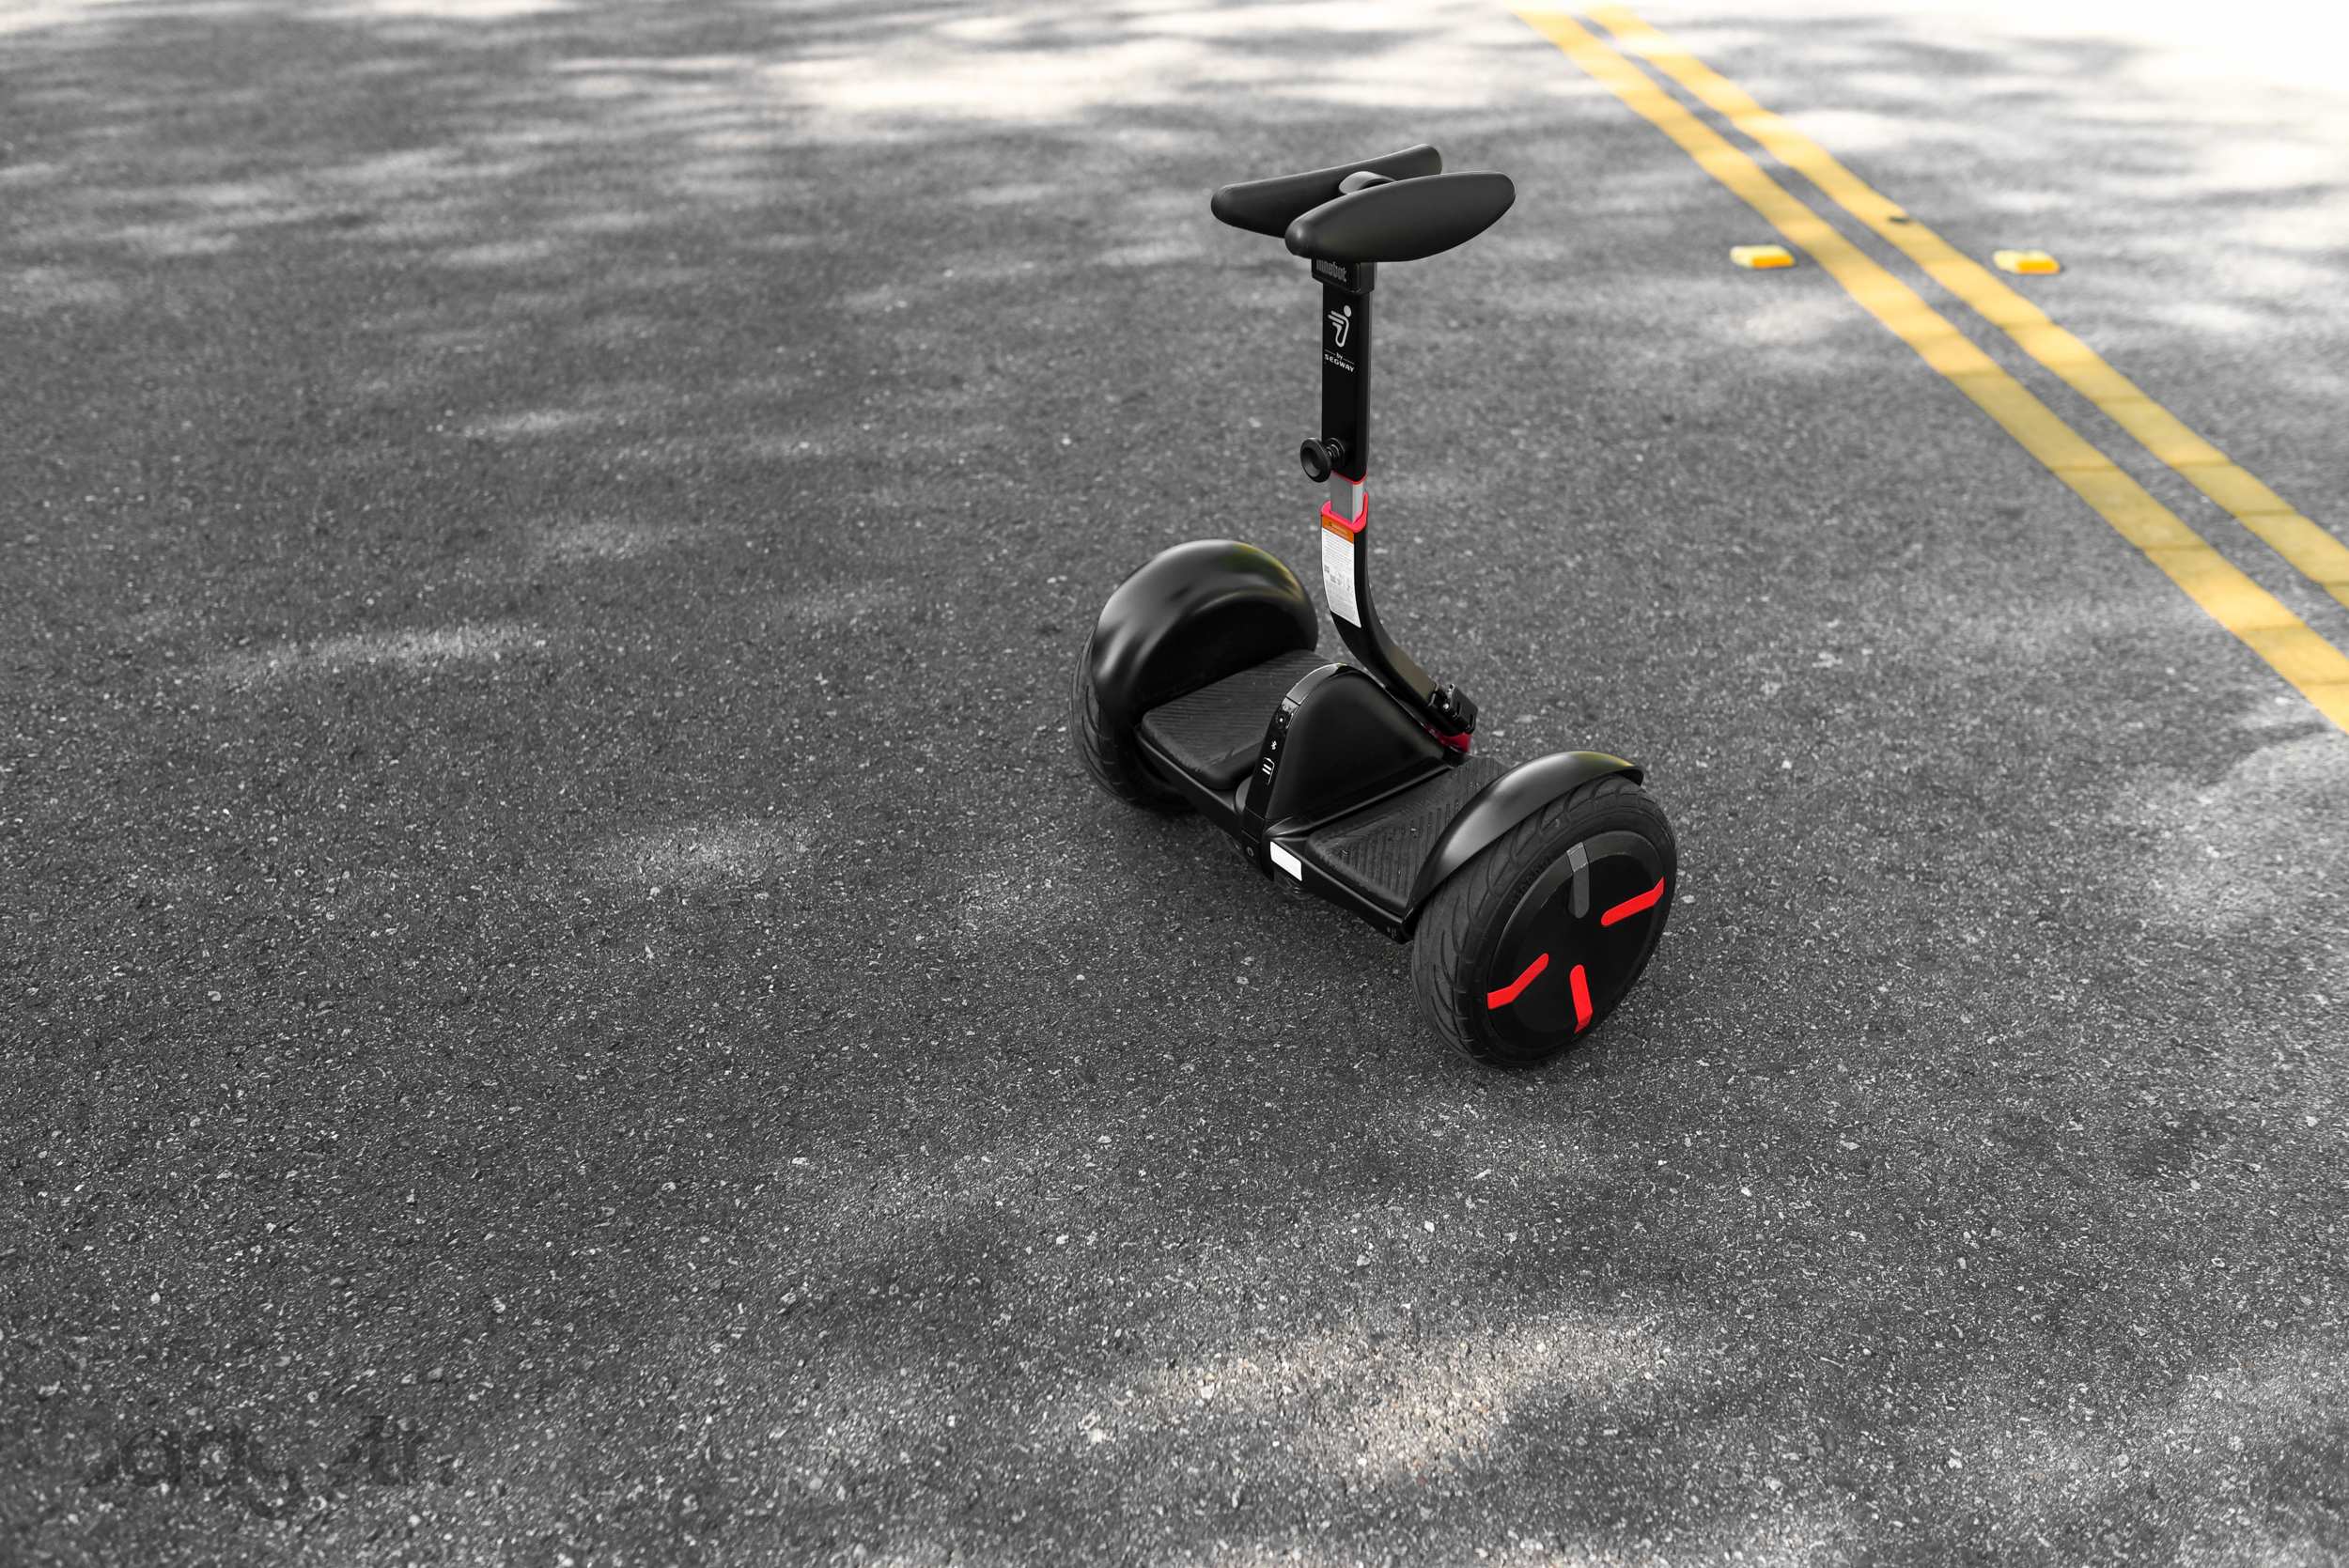 segway-minipro-personal-transporter-black.jpg